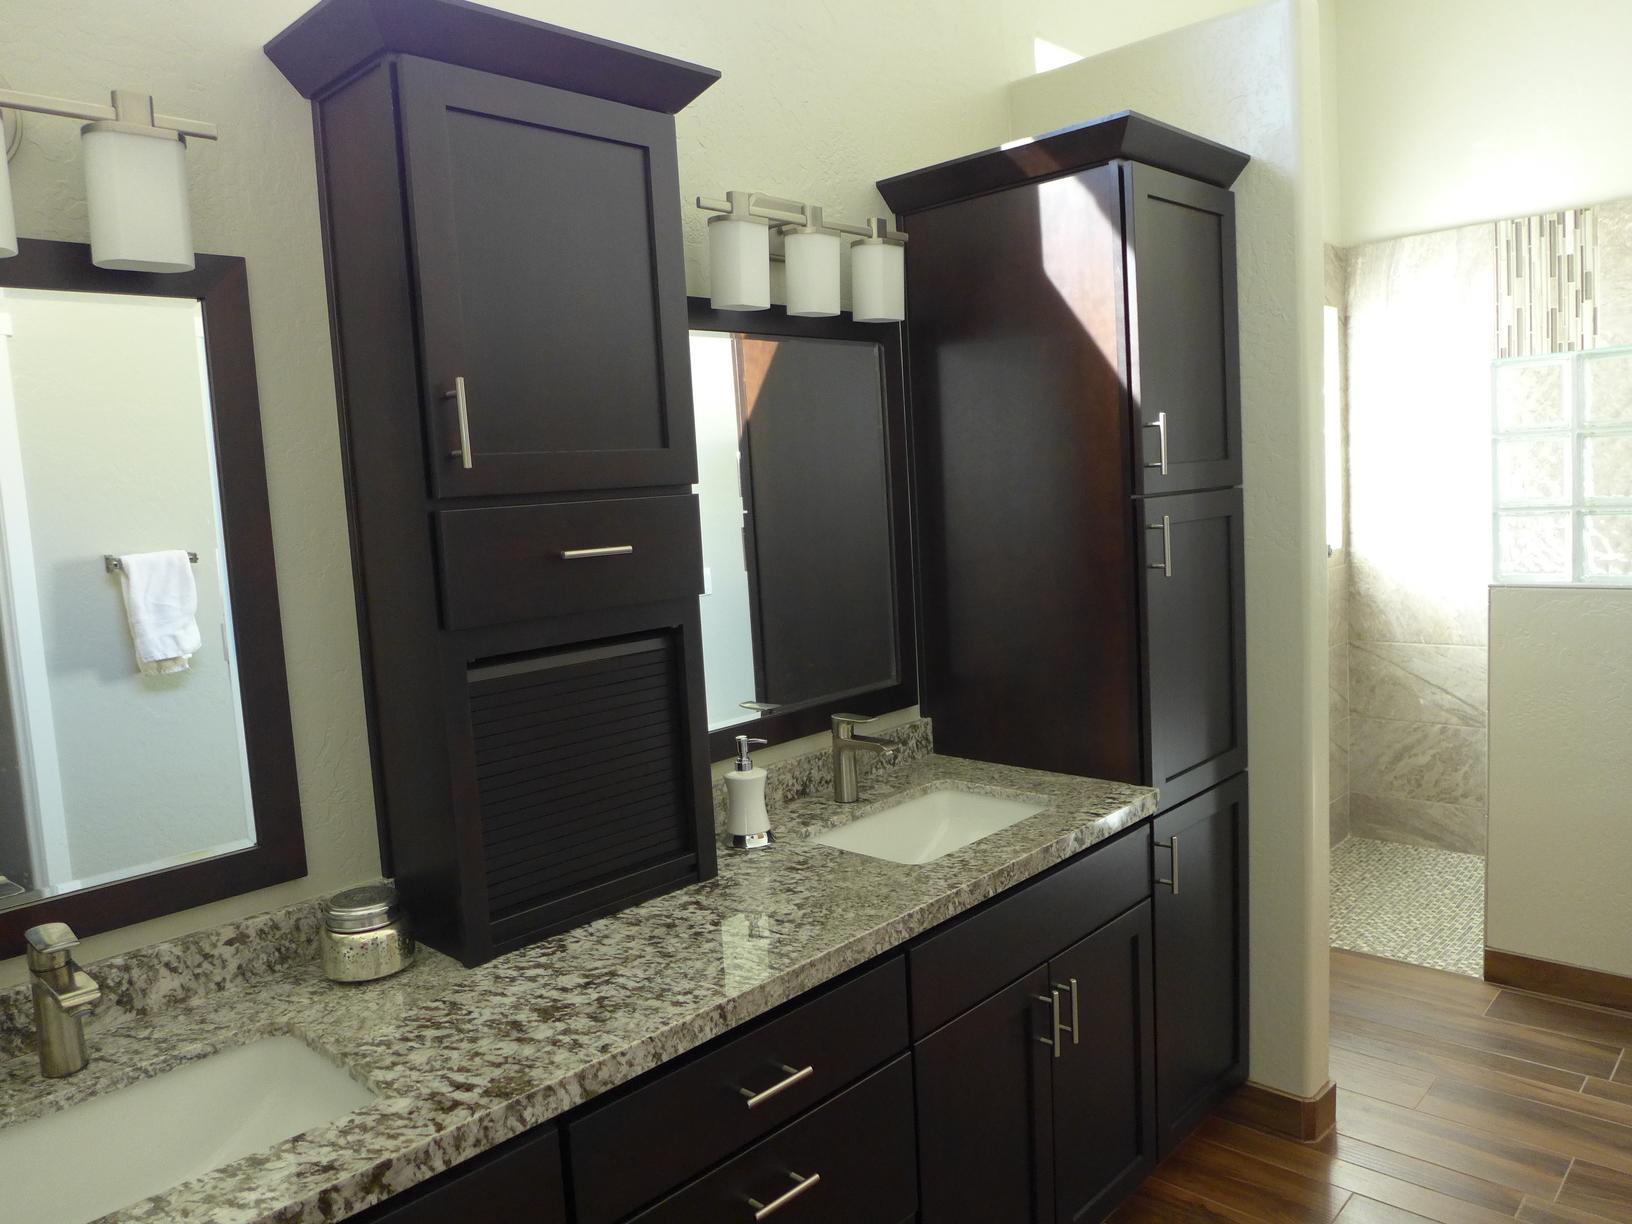 Bathroom Remodels in Fountain Hills, AZ - Bathroom Remodel ...